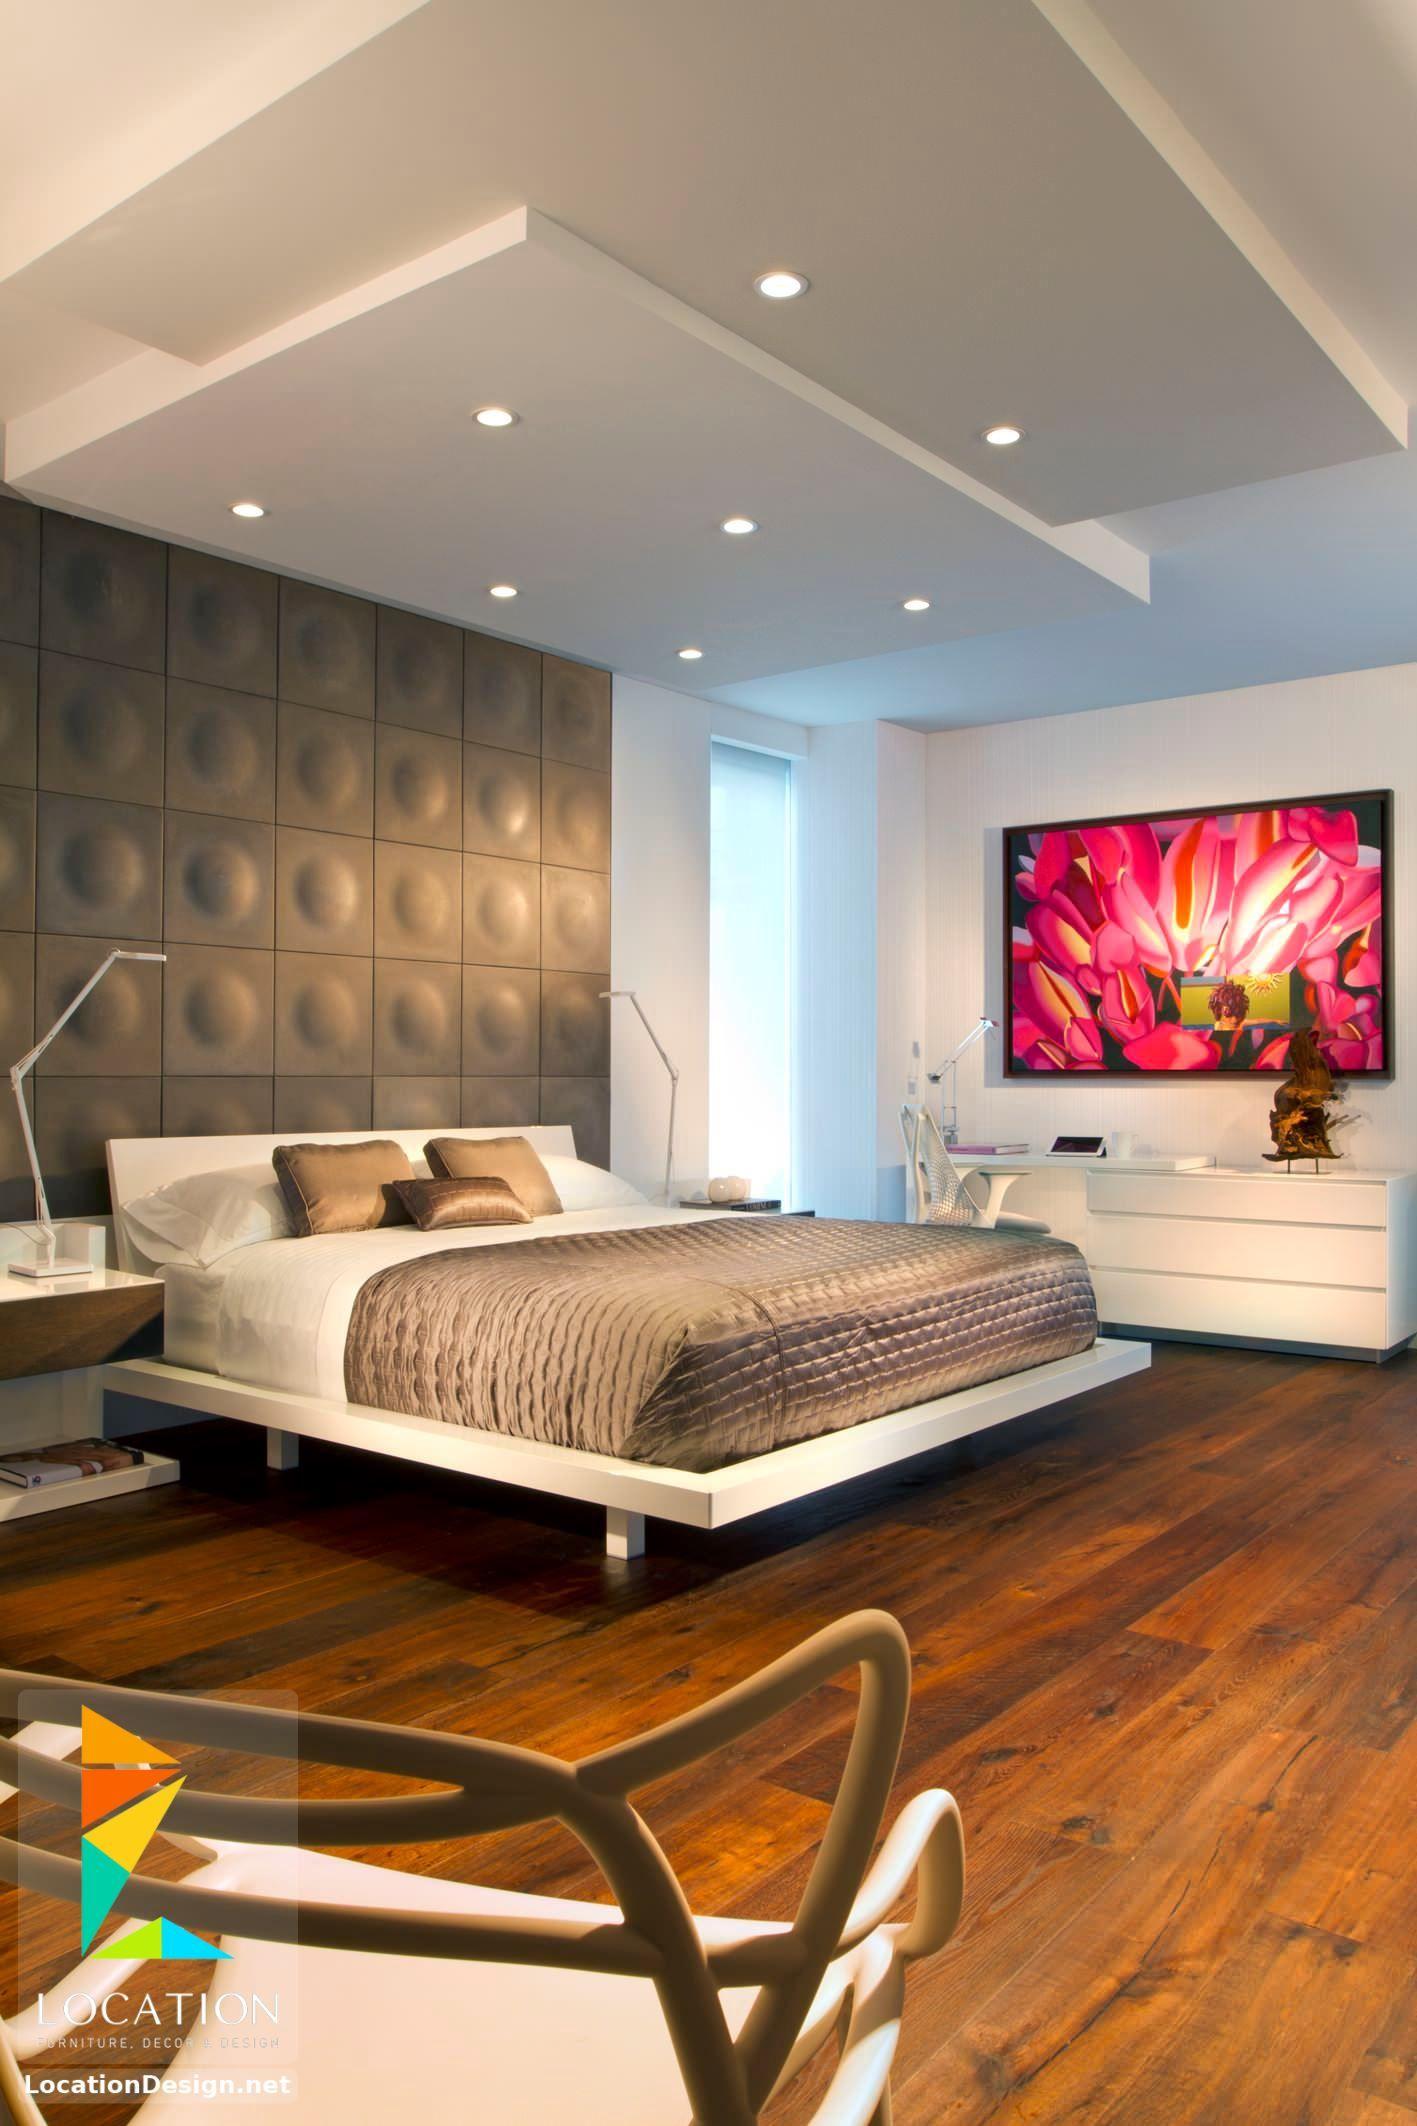 A65b252a77b غرف نوم رومانسية للعرسان مودرن 2020